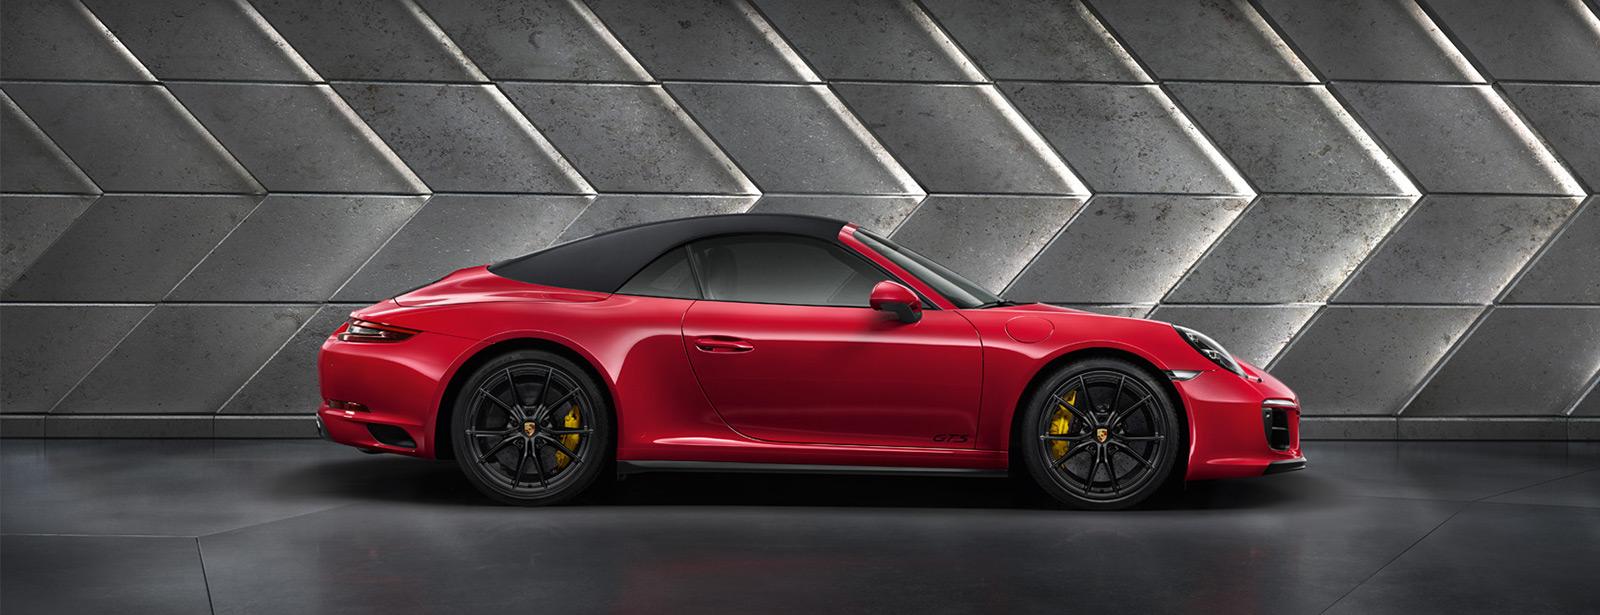 Leasingangebot   911 Carrera GTS Cabriolet